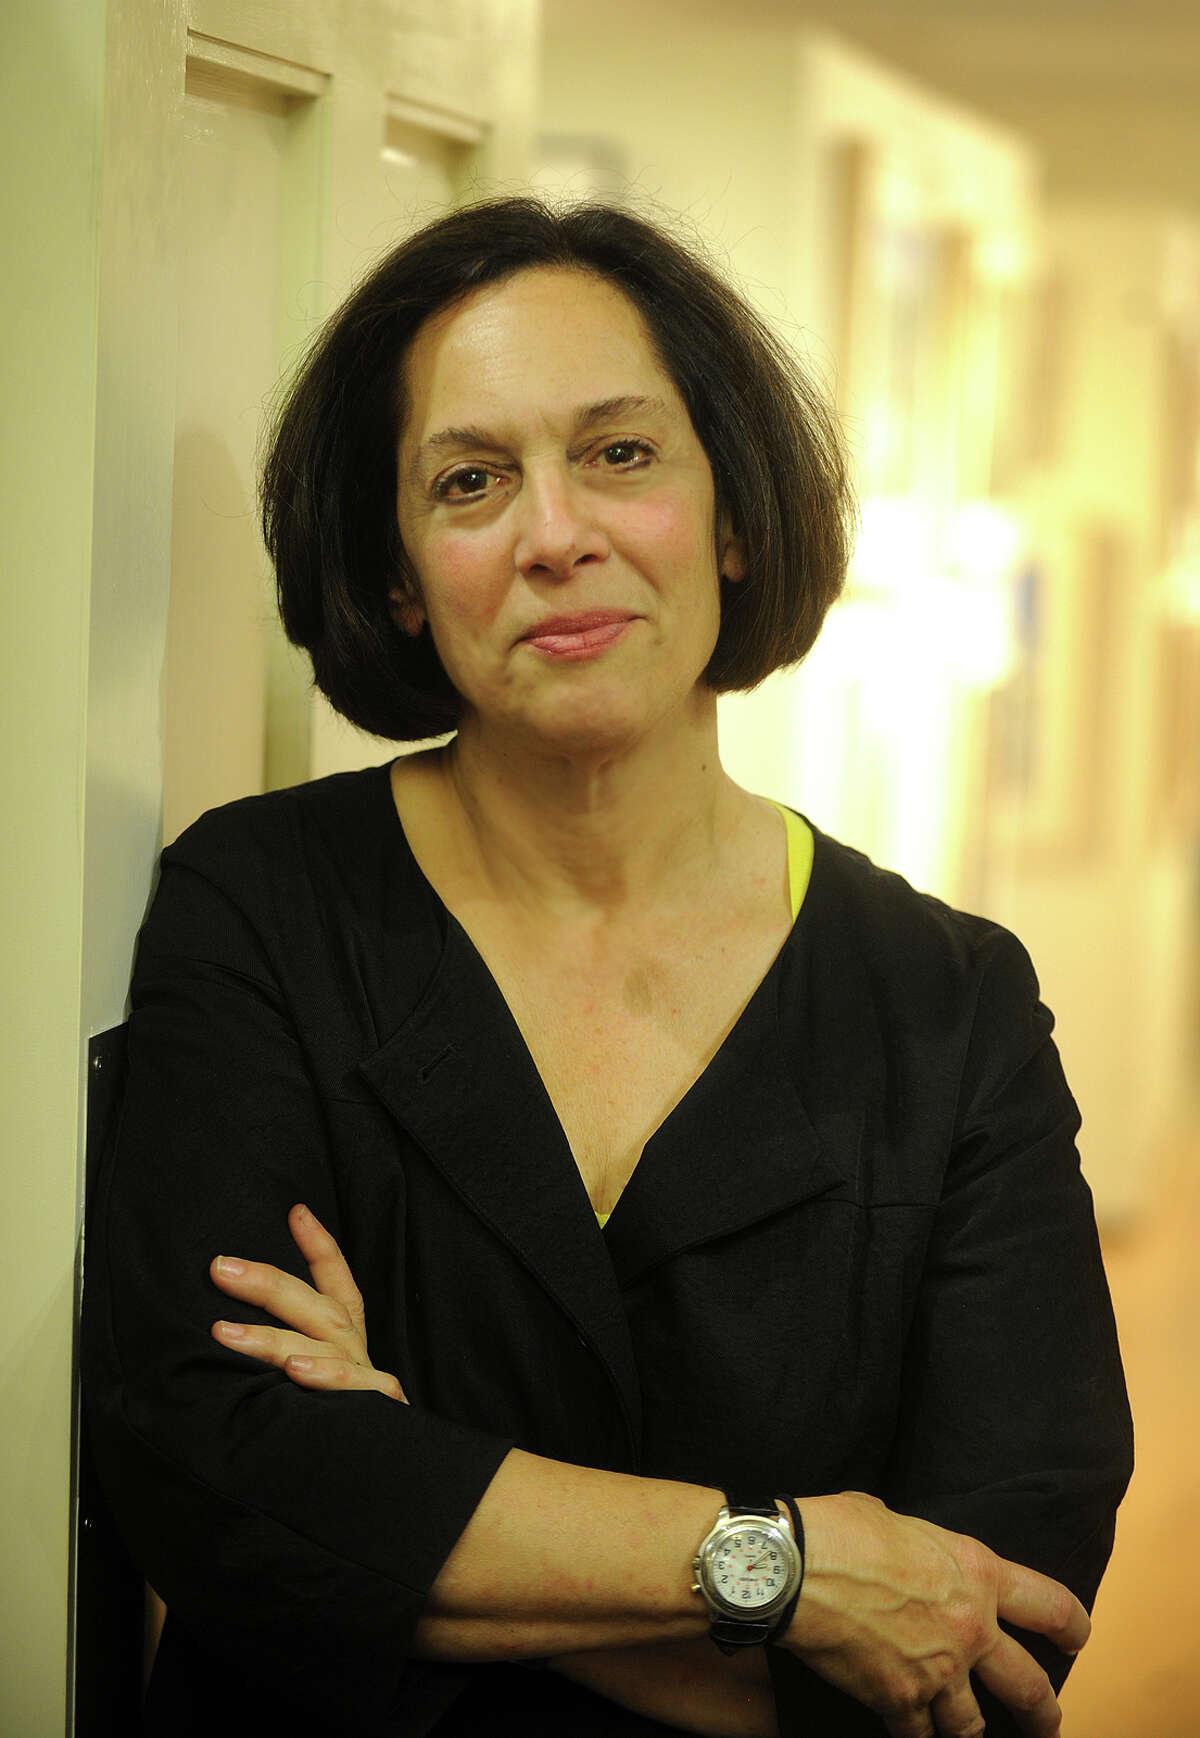 Department of Children and Families Commissioner Joette Katz